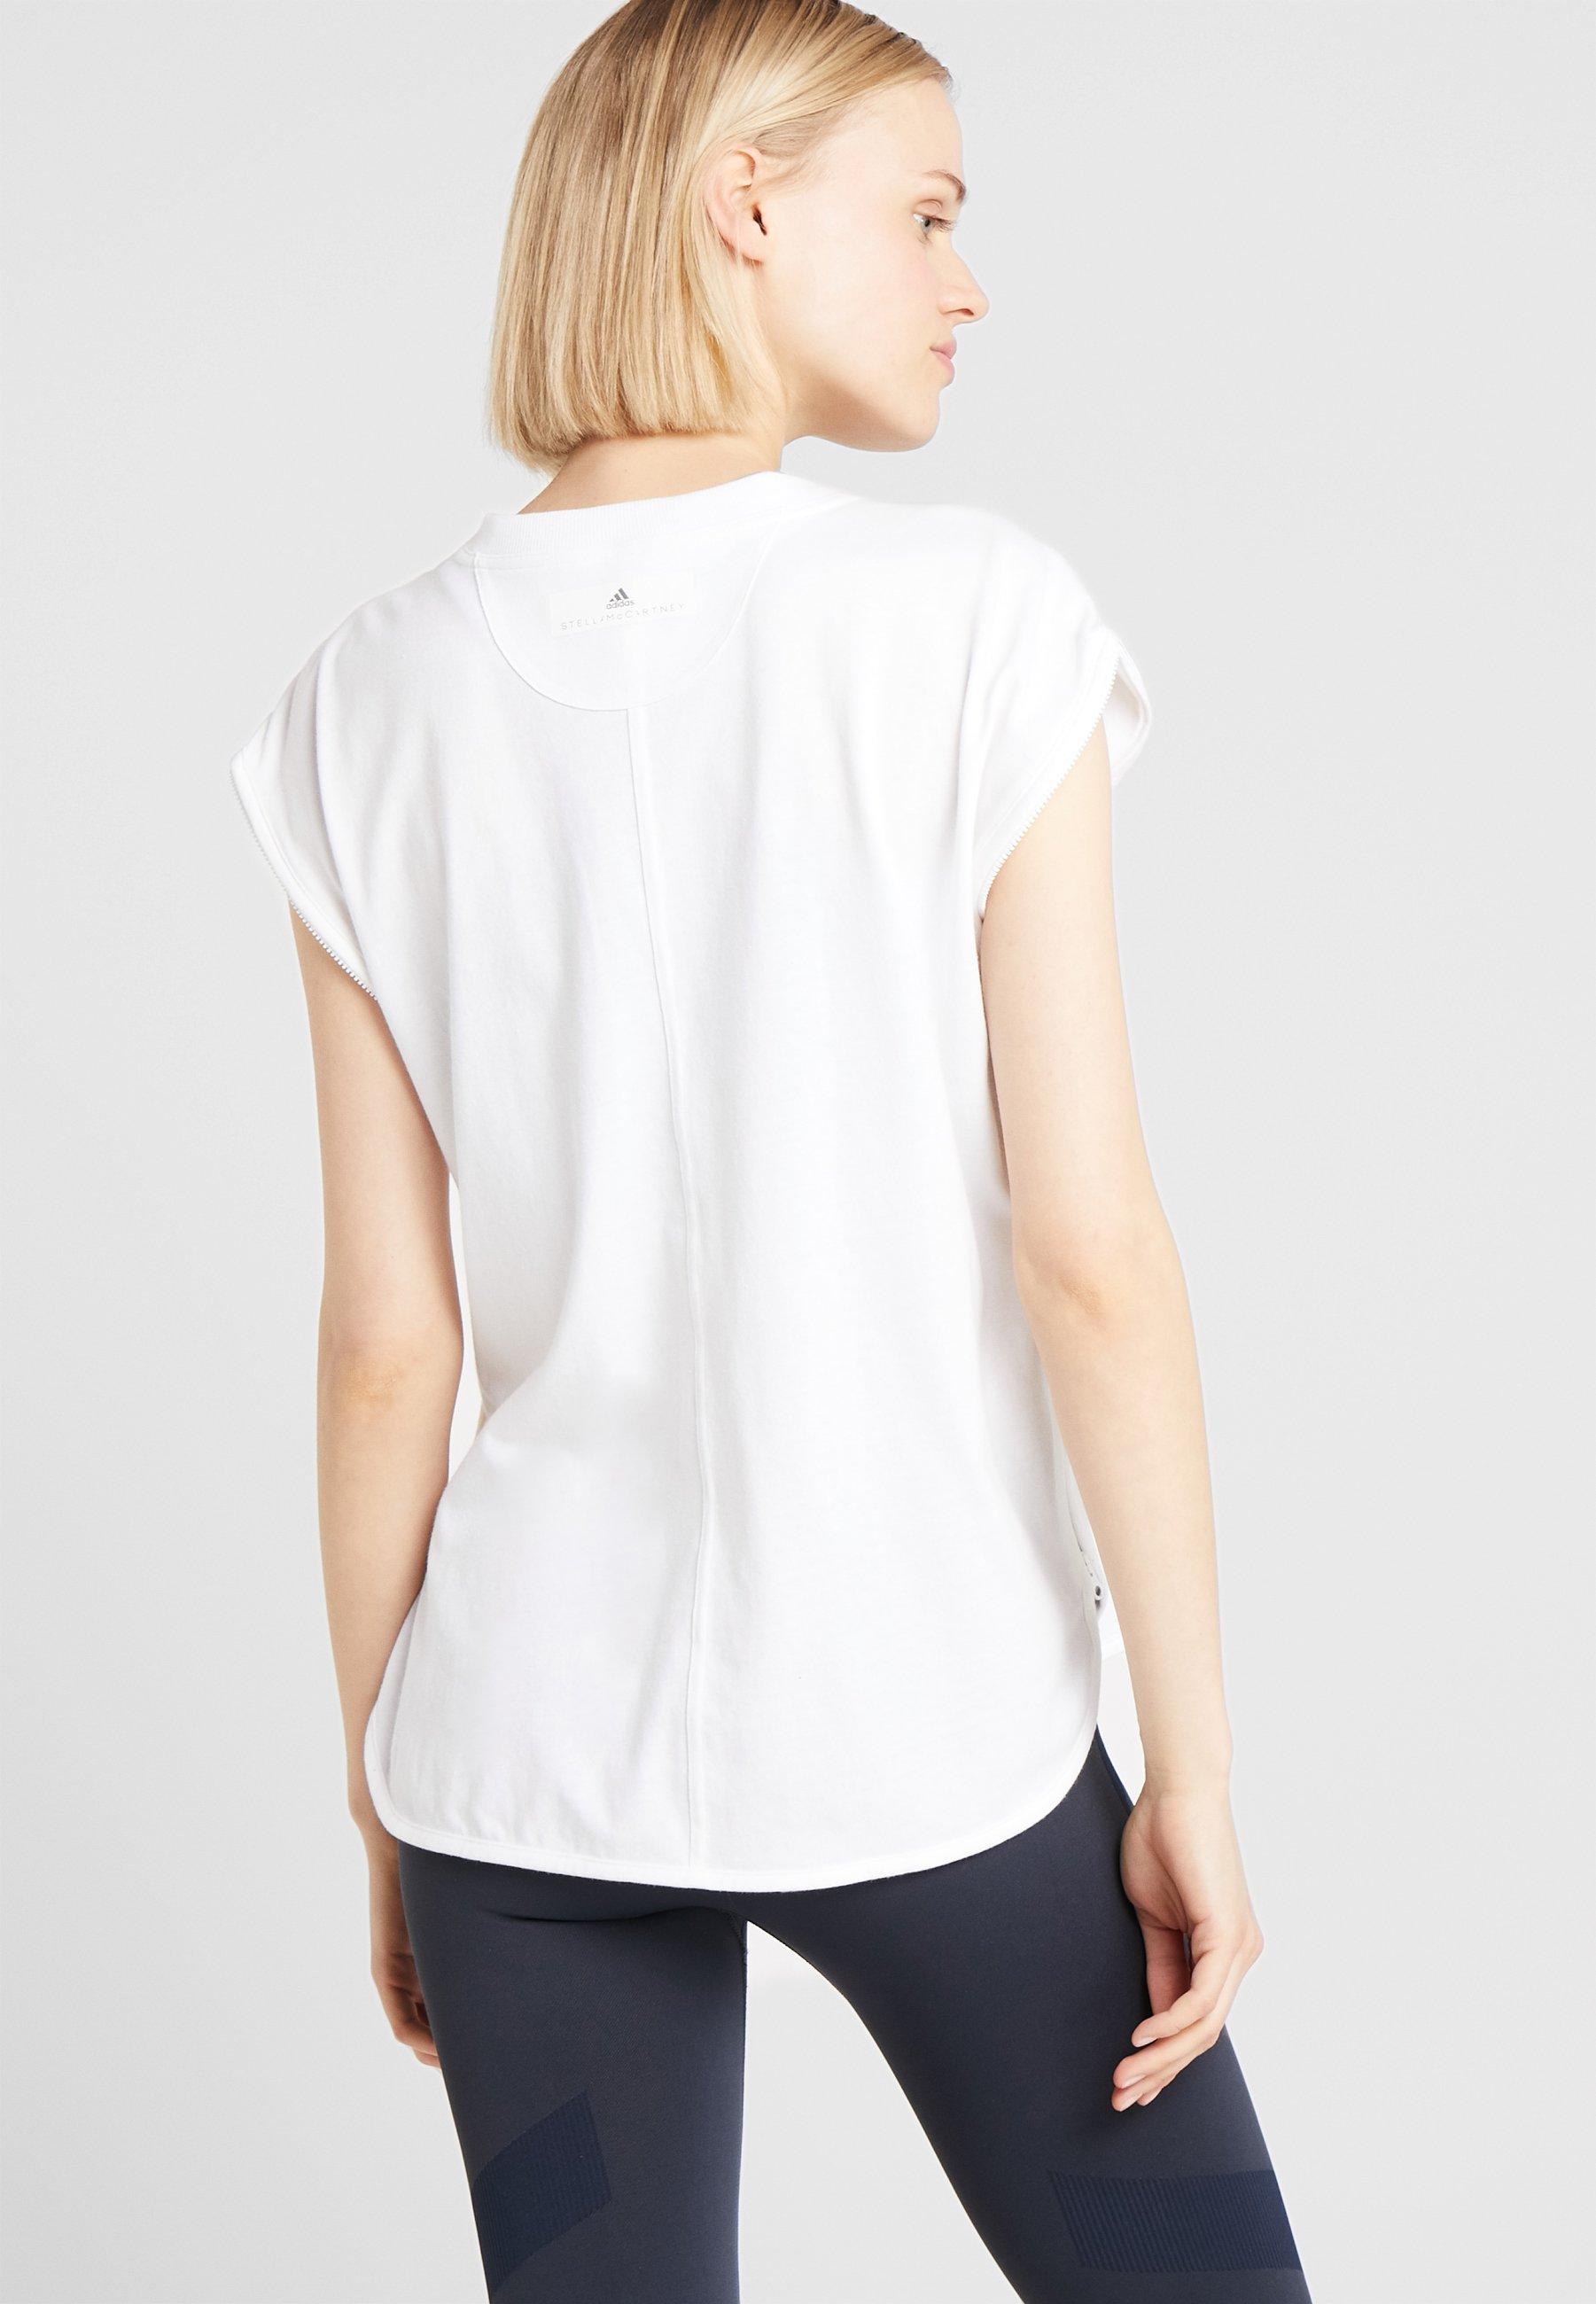 By White GraphicT shirt Imprimé Adidas Mccartney Stella 34LRq5jASc